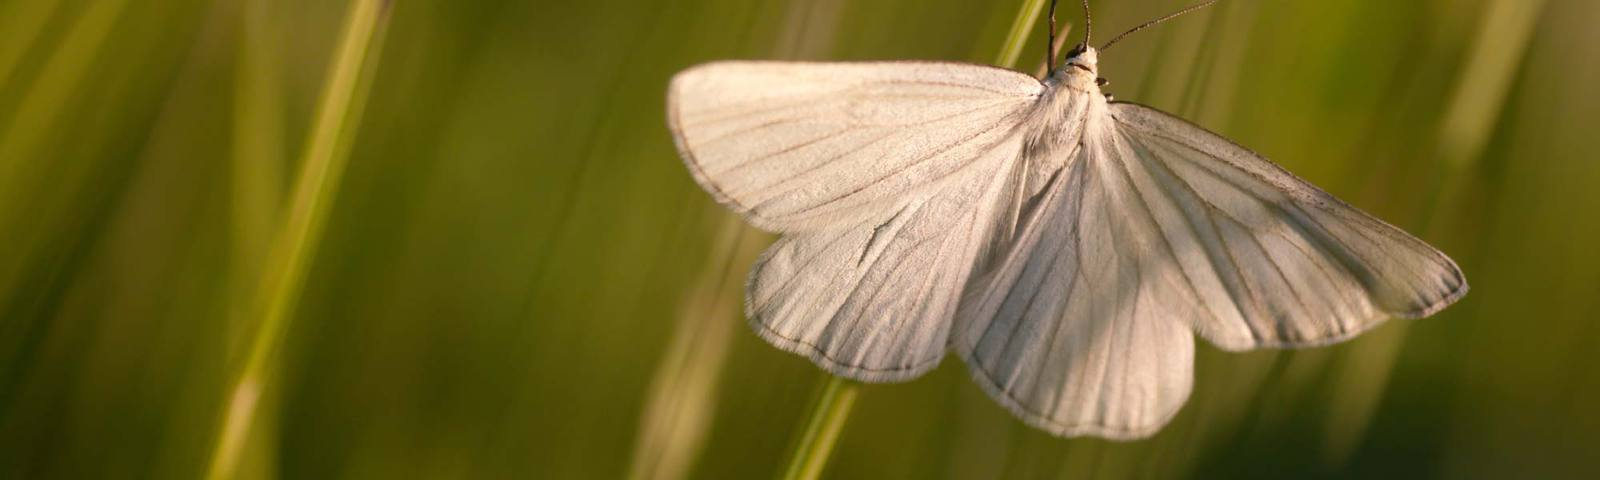 Moth Pest Control in Essex & Suffolk